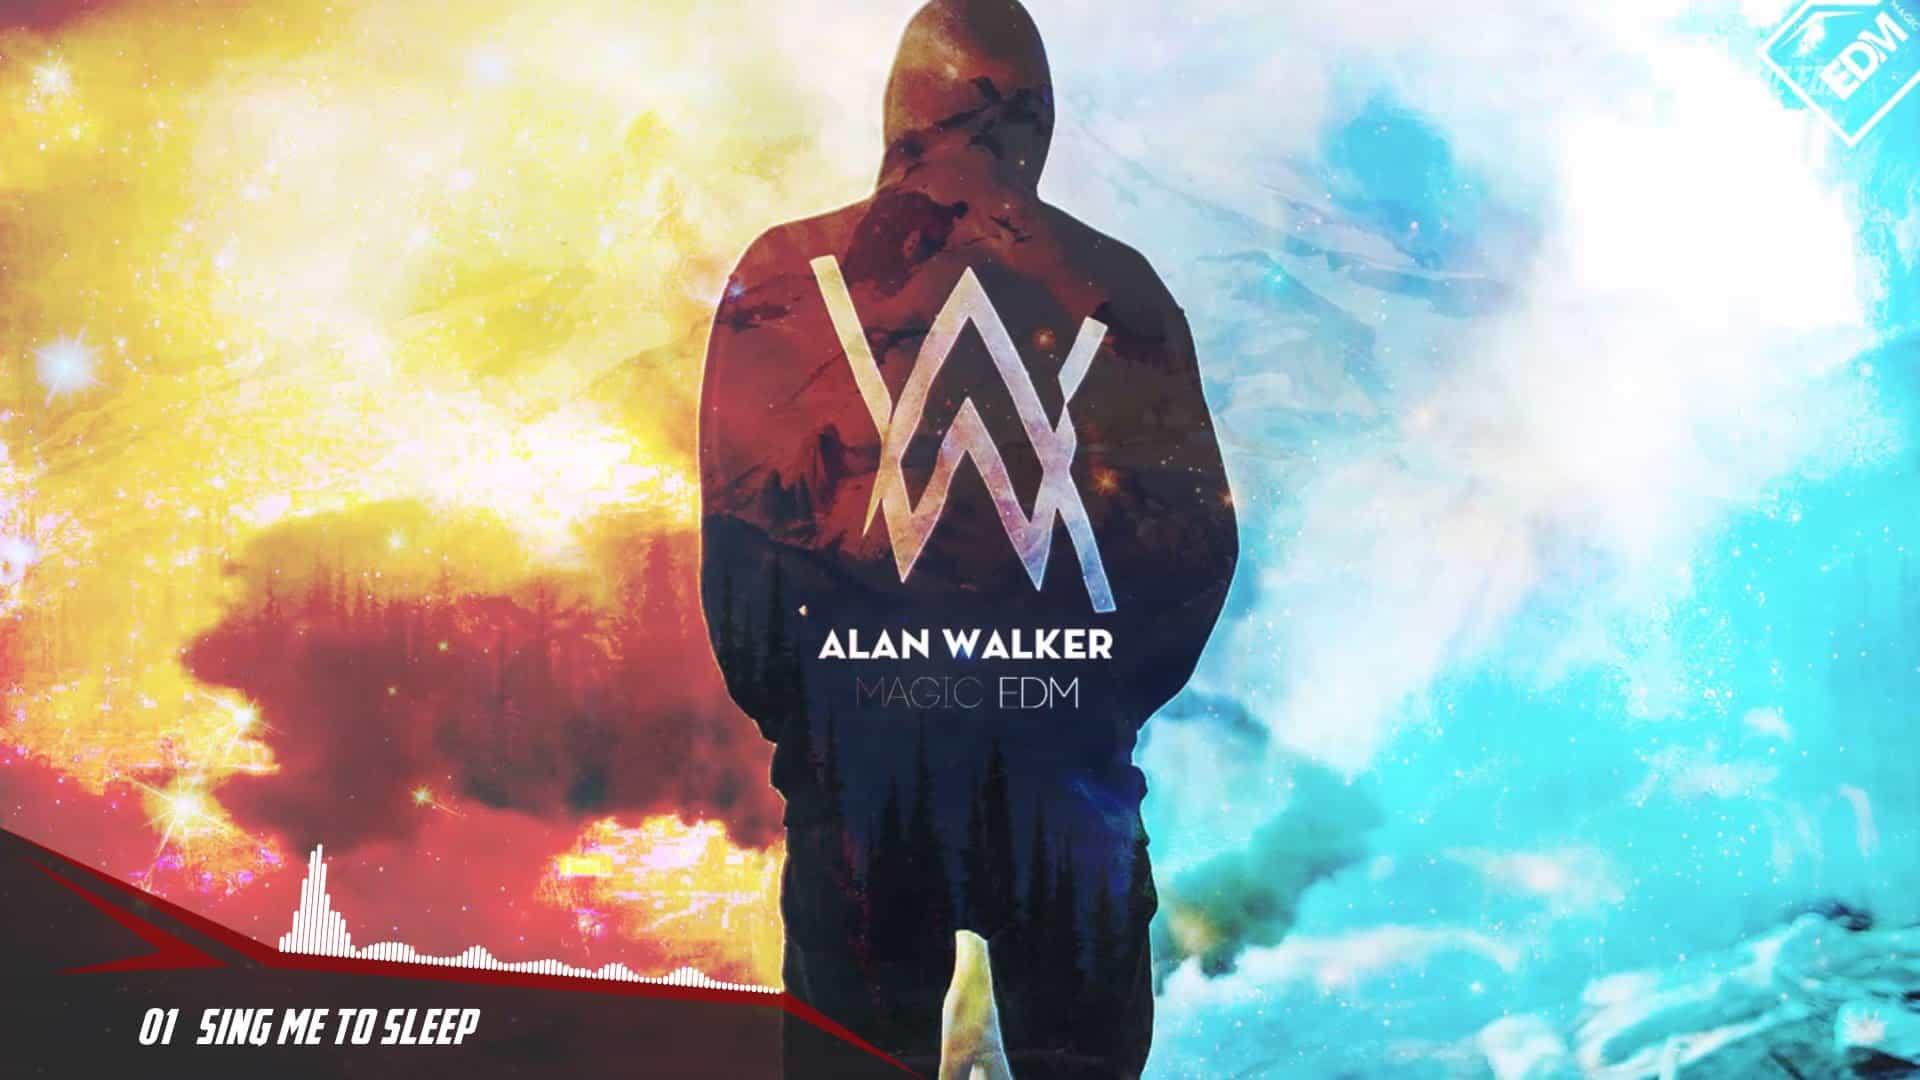 On my way lyrics alan walker meaning in hindi